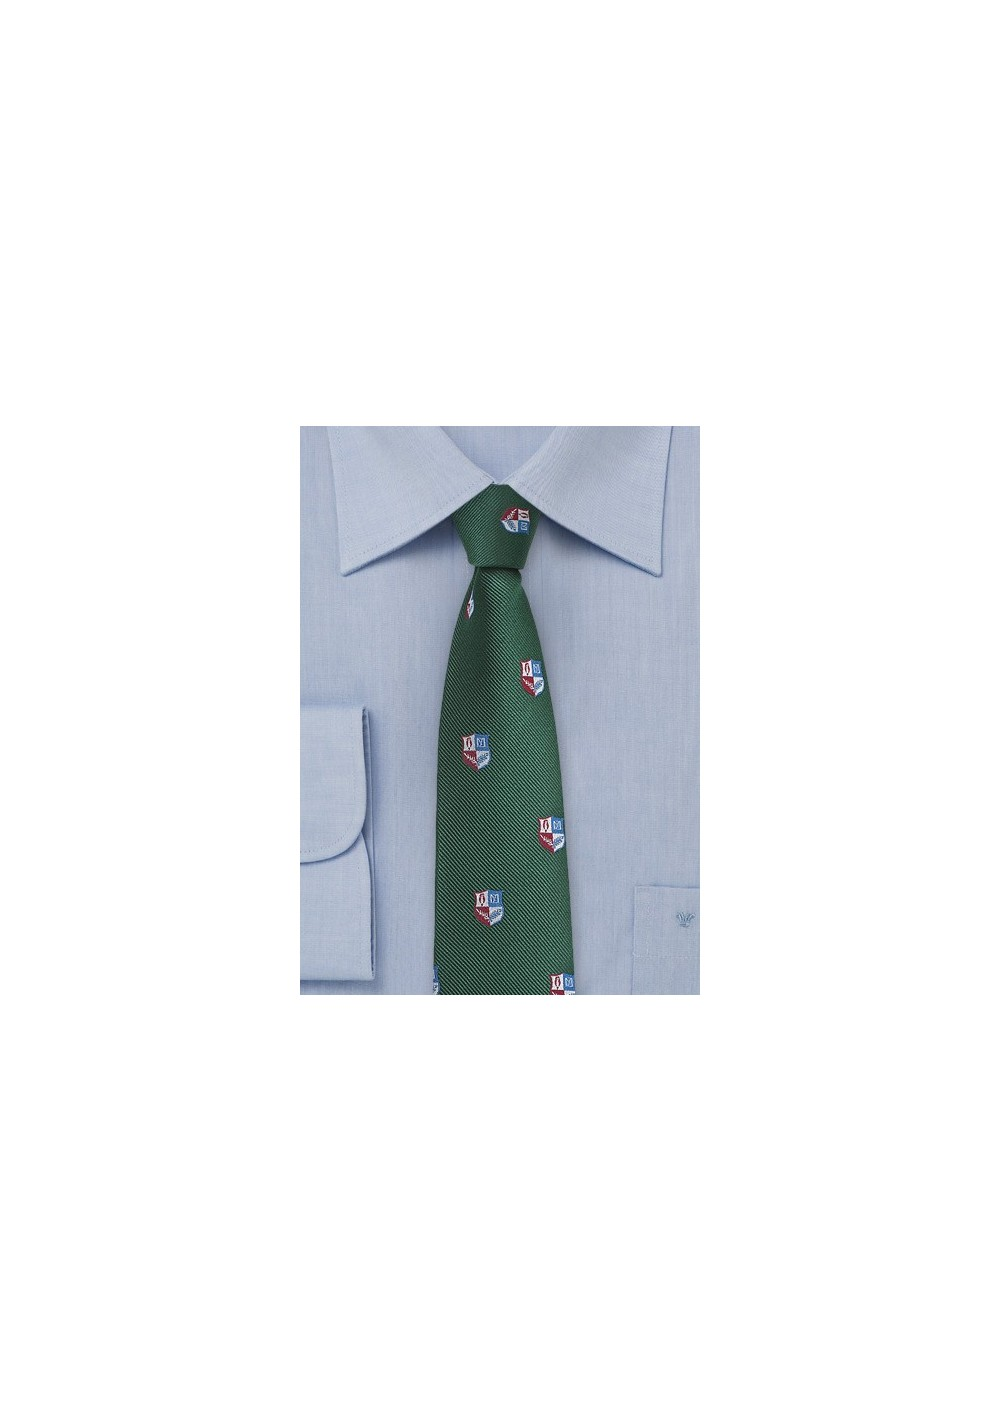 Crested Repp Tie in Dark Hunter Green